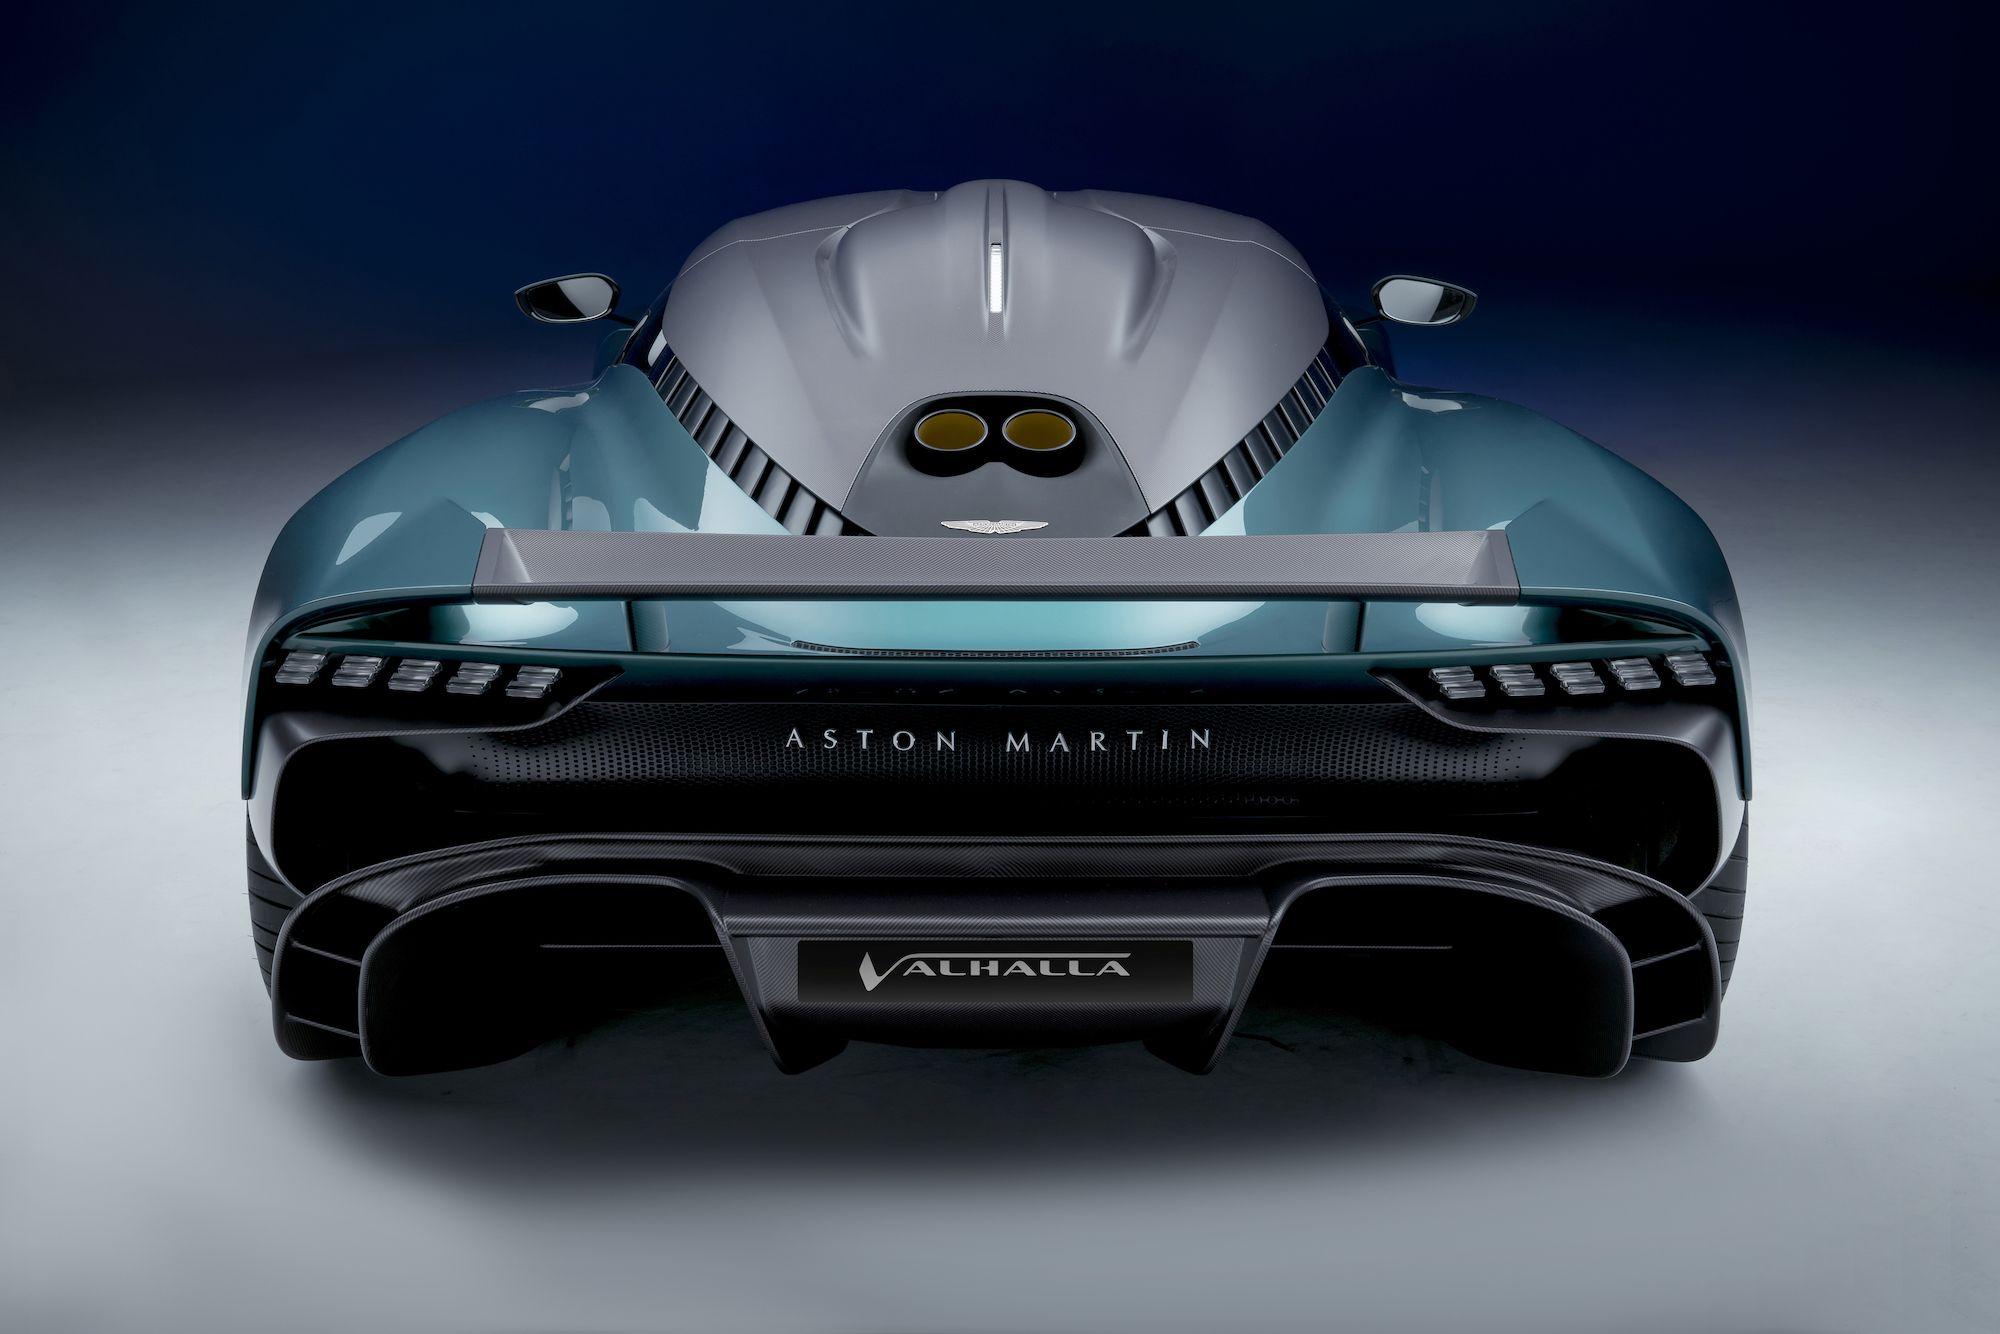 Aston_Martin_Valhalla04.jpg